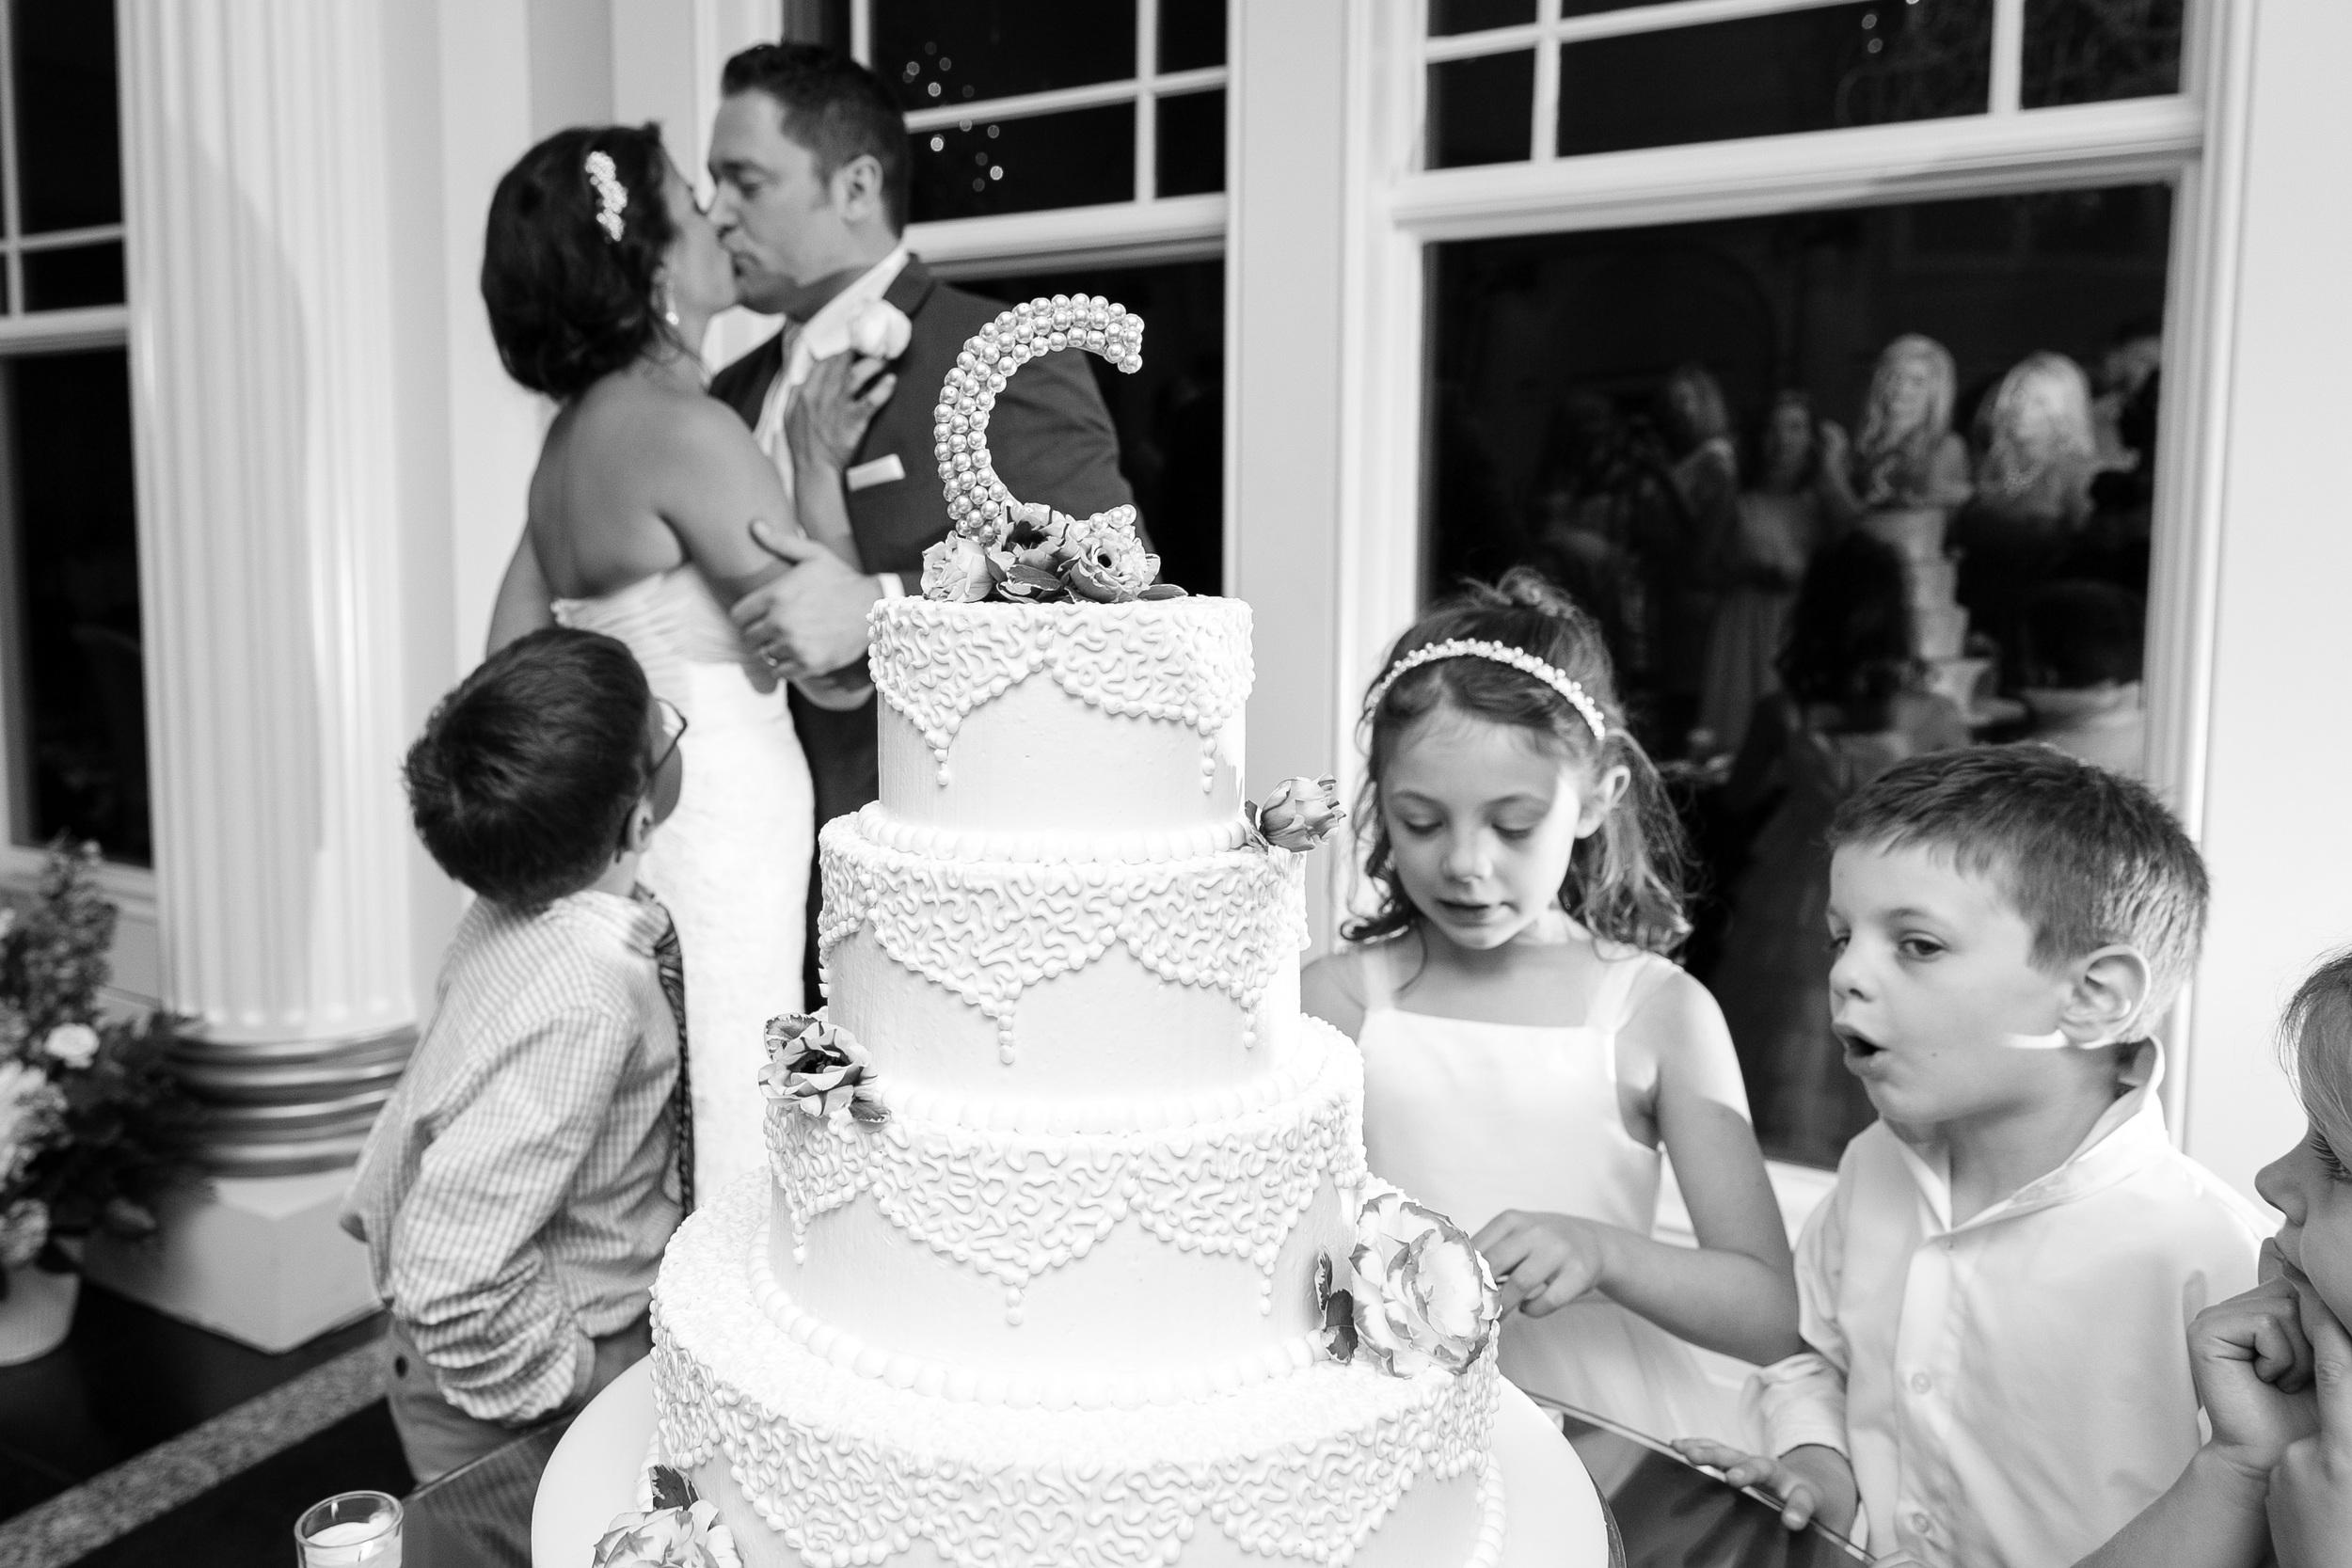 Riverview-Wedding-Simsbury-Connecticut-Documentary-Photography-by-Jacek-Dolata-5.jpg